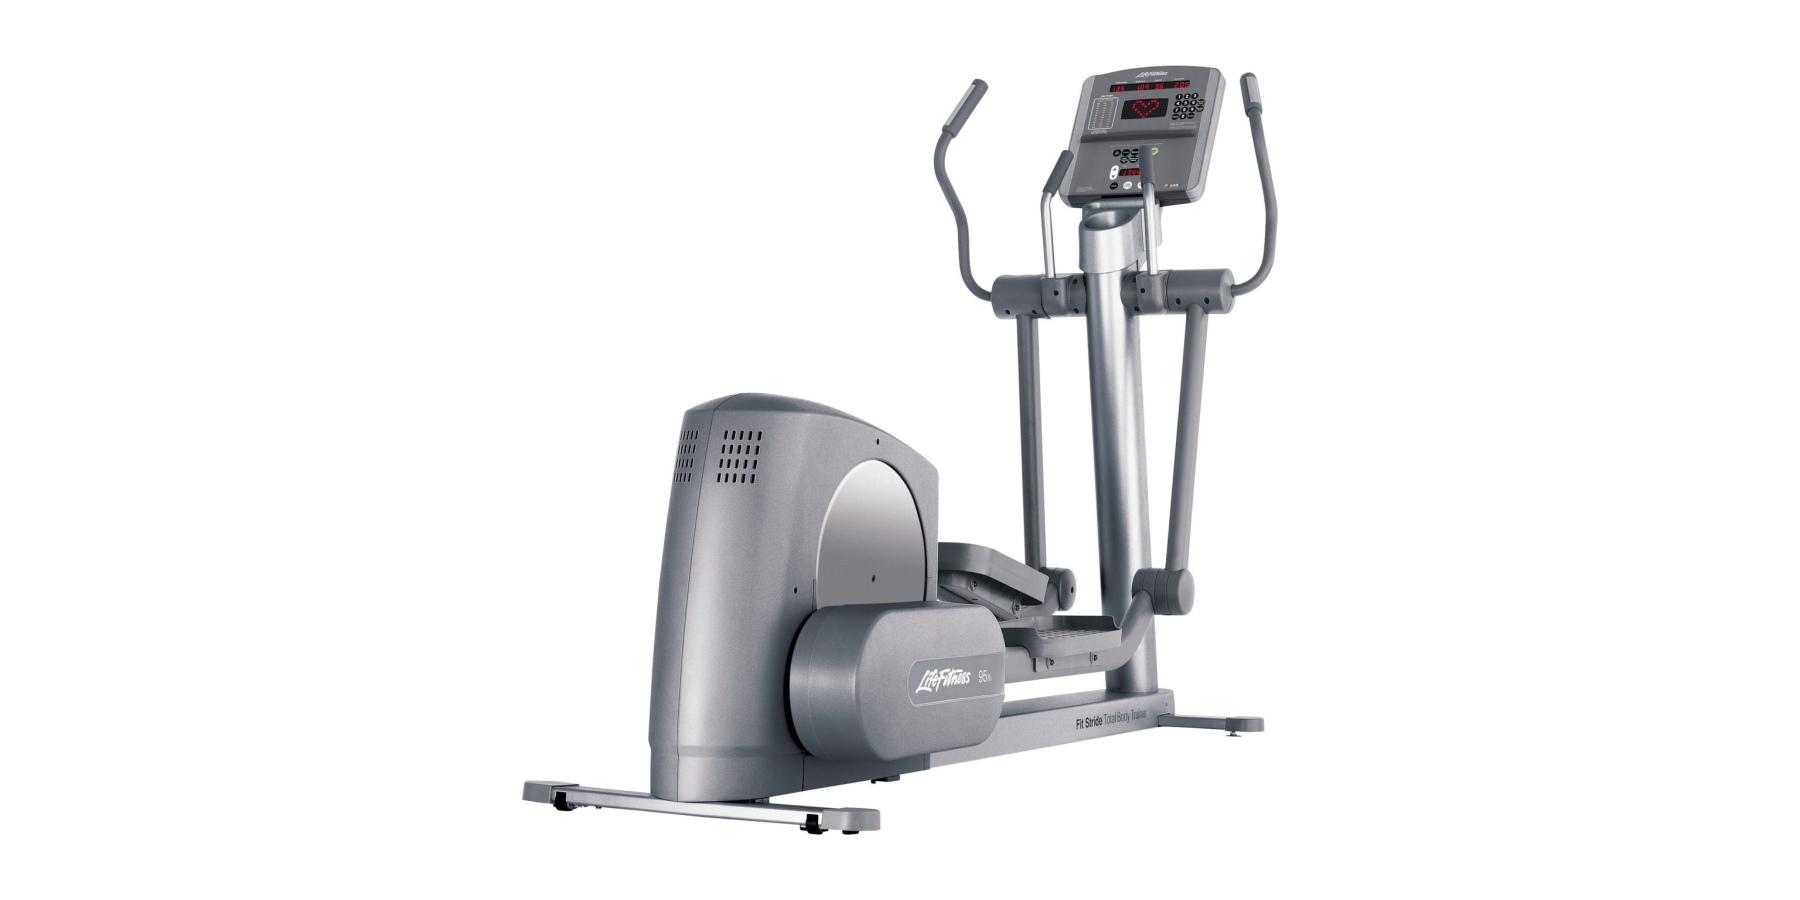 Life-Fitness-95Xi-hasznaltkondigepek-hu-hasznalt-elliptikus-trener-1536×1536-sfwe